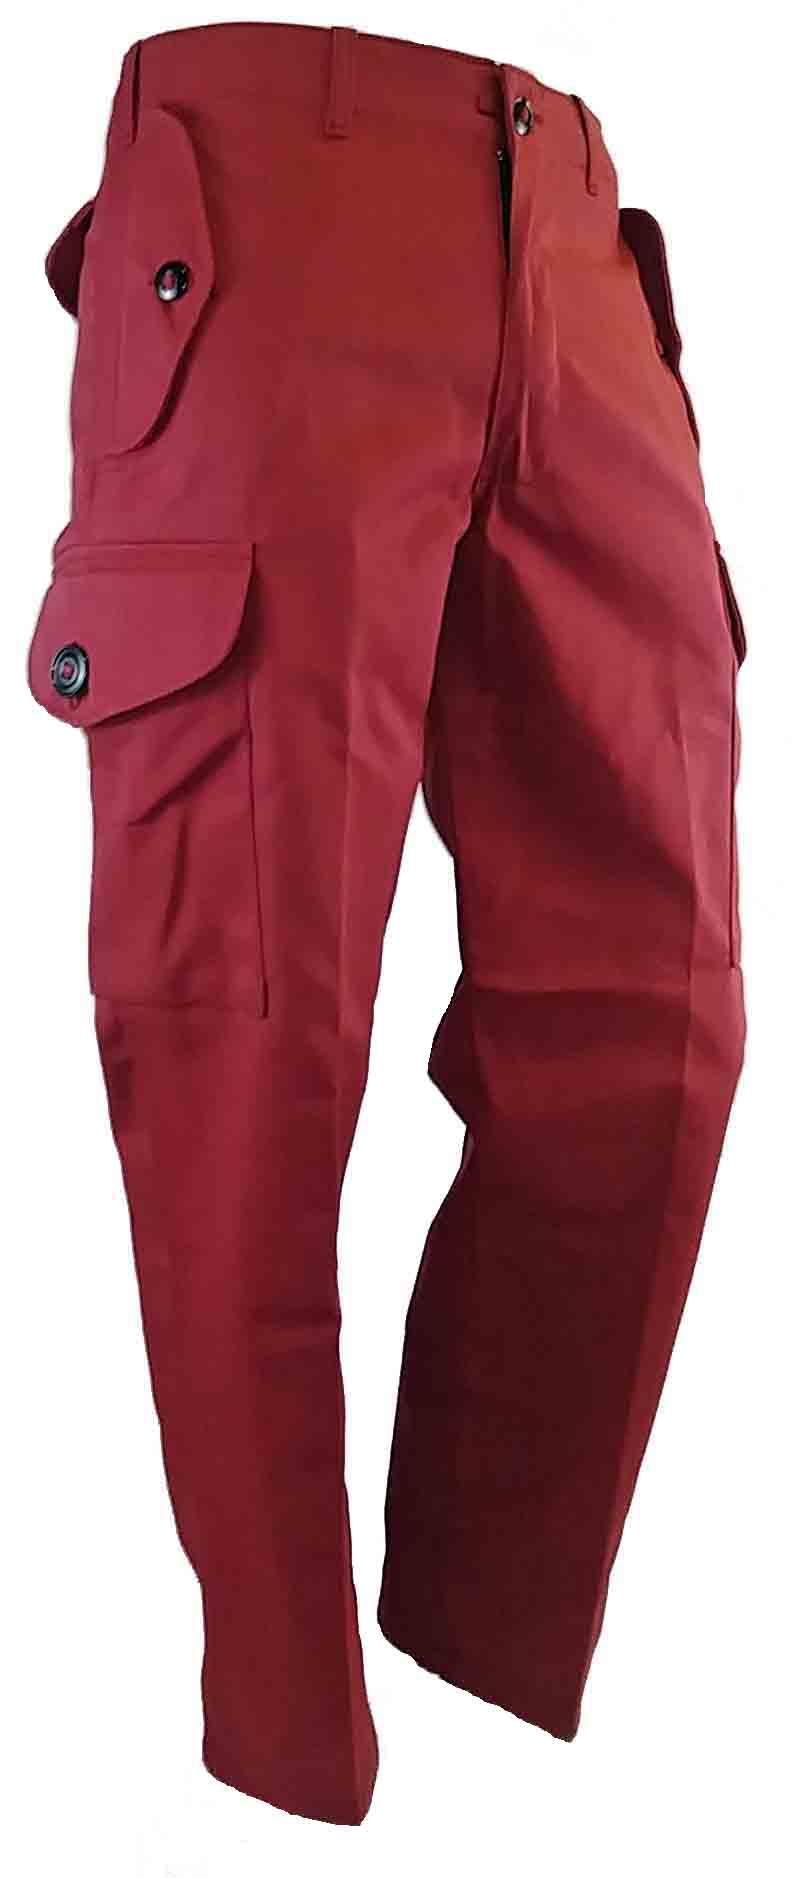 SGS pantalons de combat canadien *VENTE*